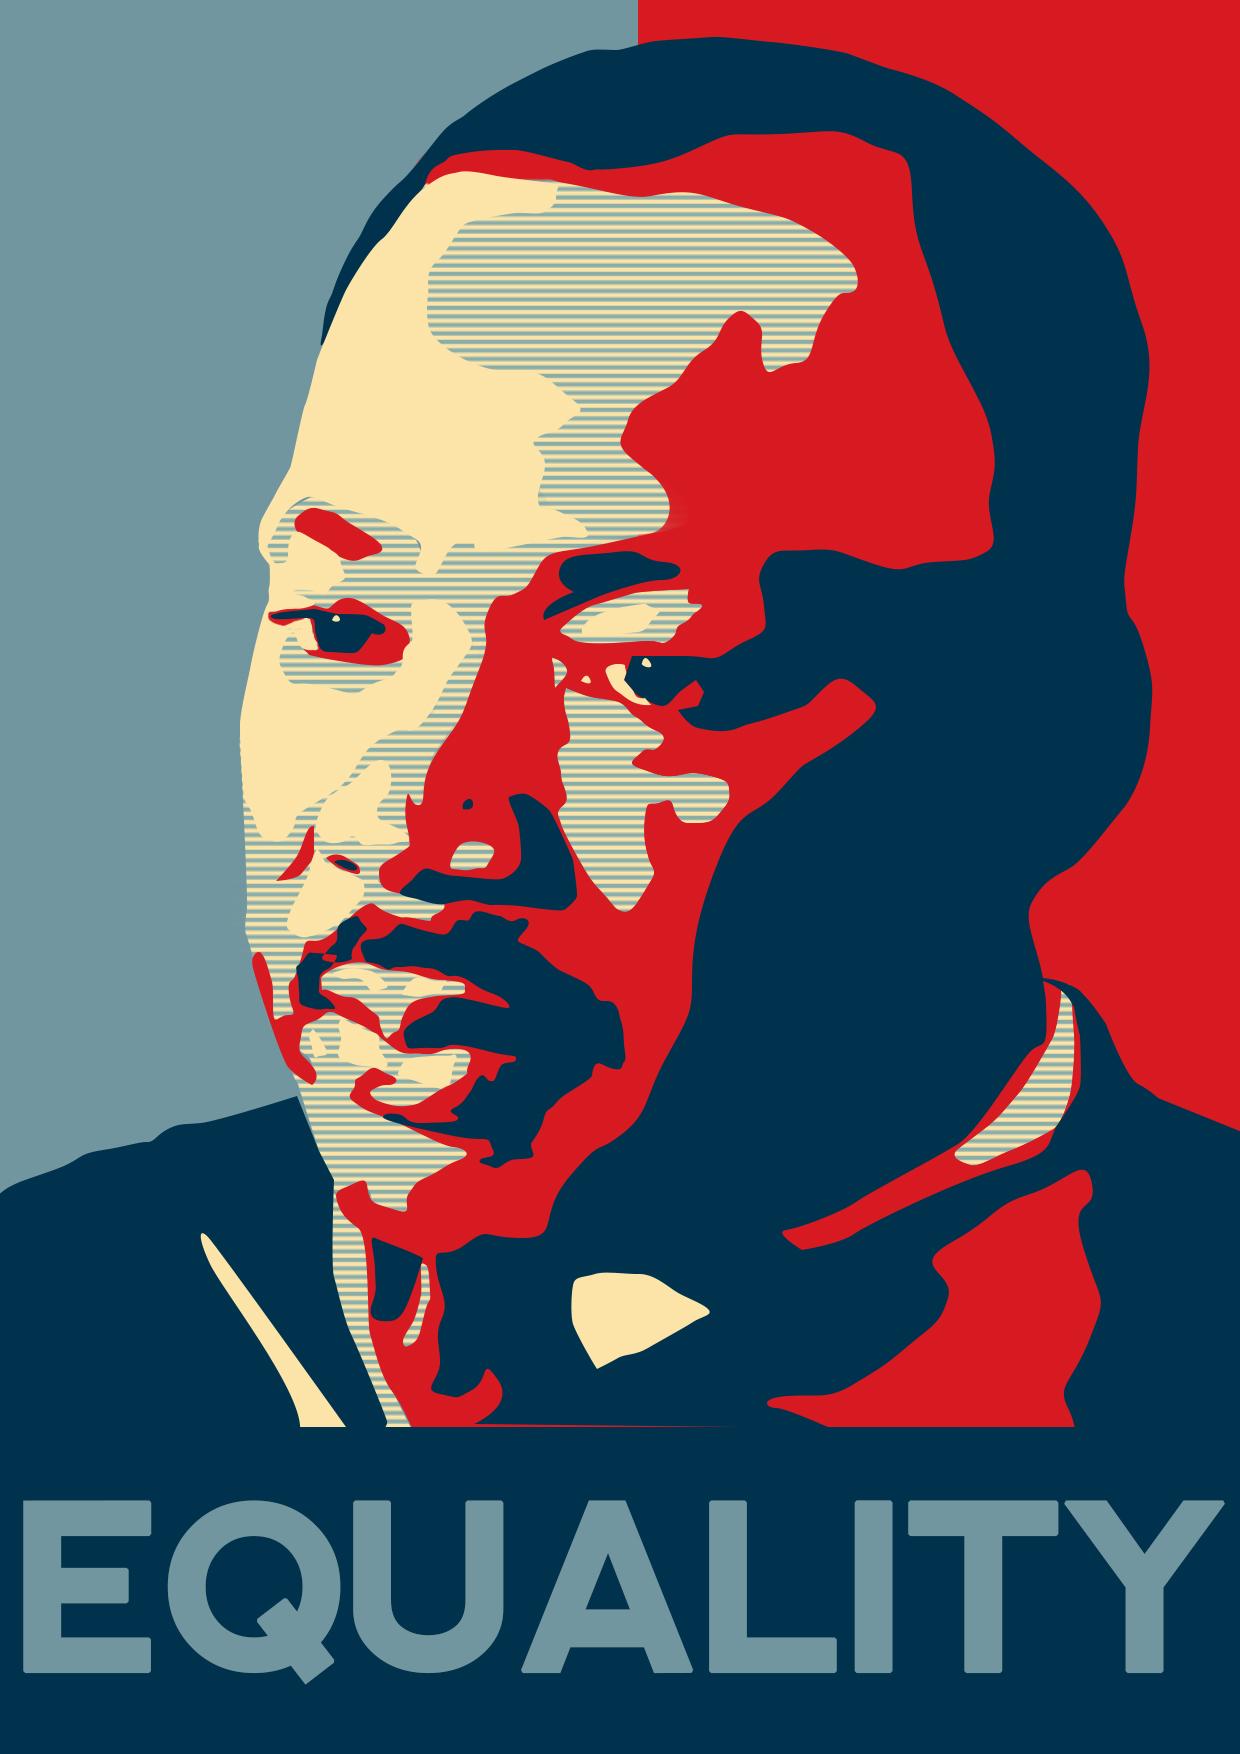 Martin Luther King Poster by MalteBlom on DeviantArt